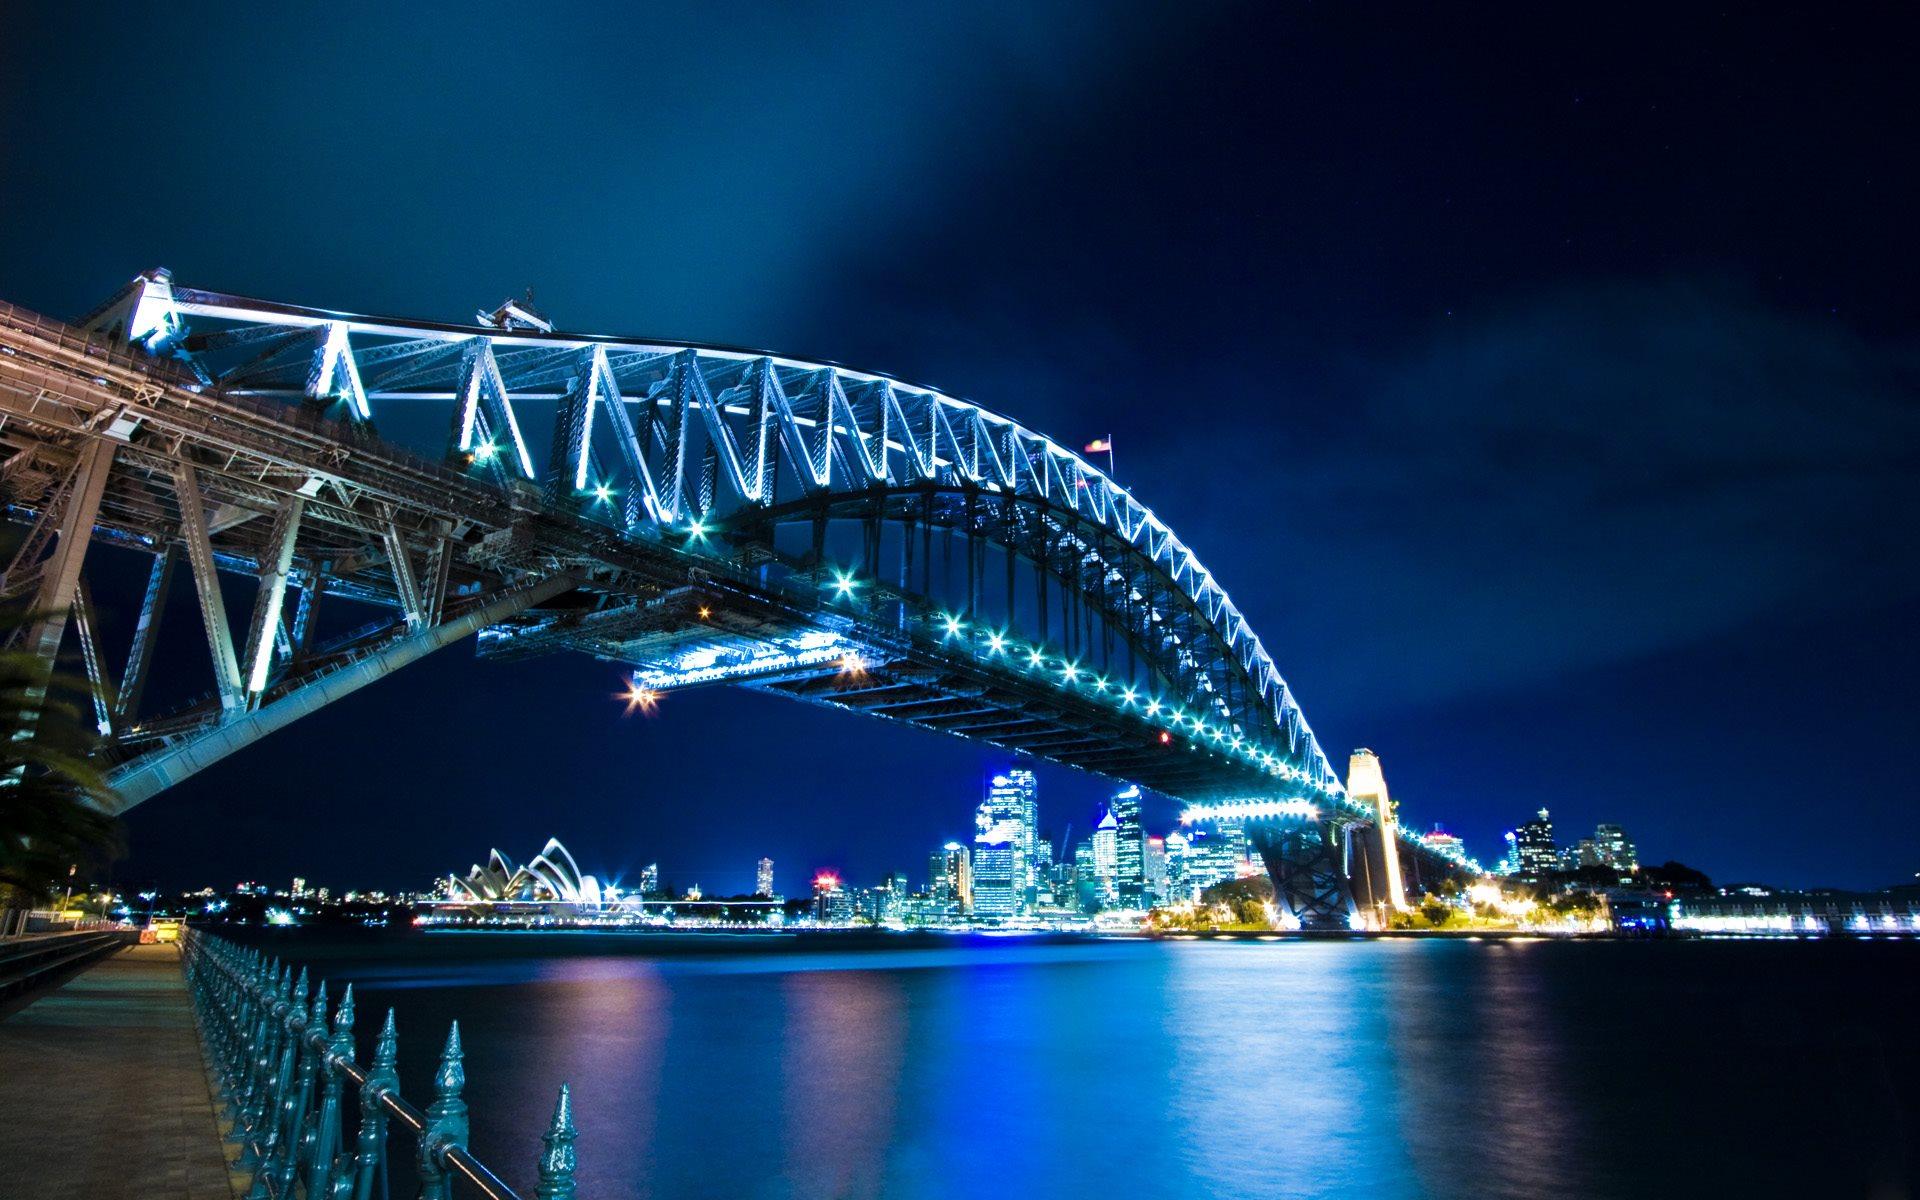 Sydney harbour bridge wallpaper 1920x1200 altavistaventures Choice Image